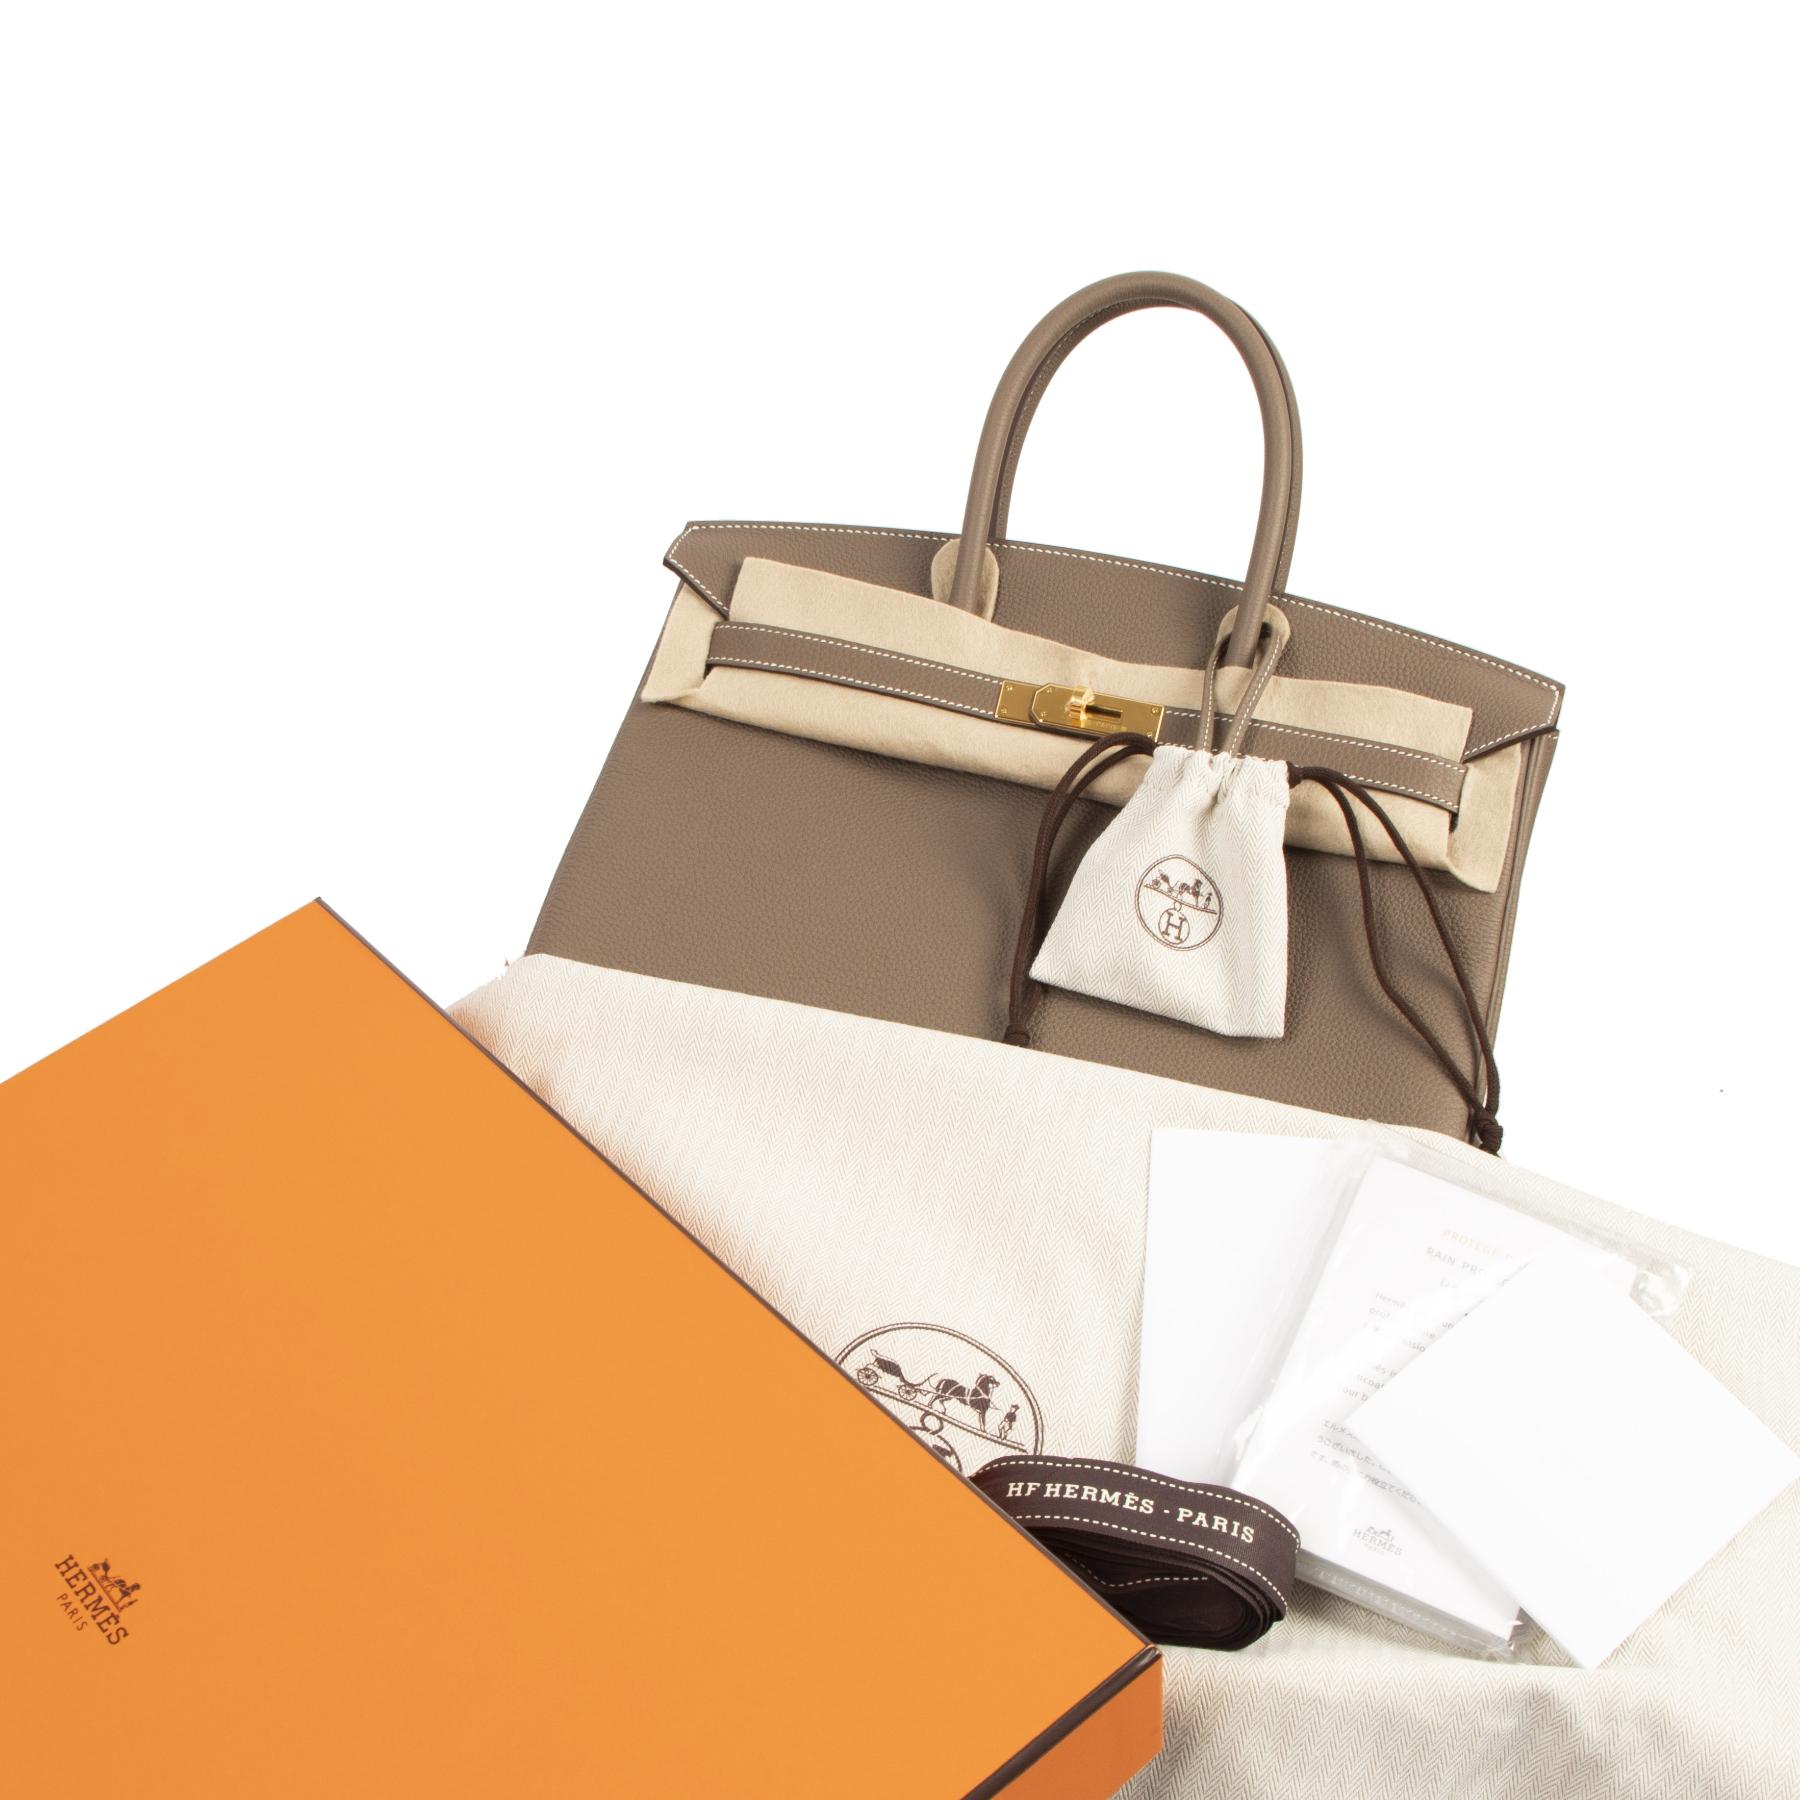 Authentieke tweedehands vintage Hermès Birkin 35 Etoupe Togo GHW koop online webshop LabelLOV